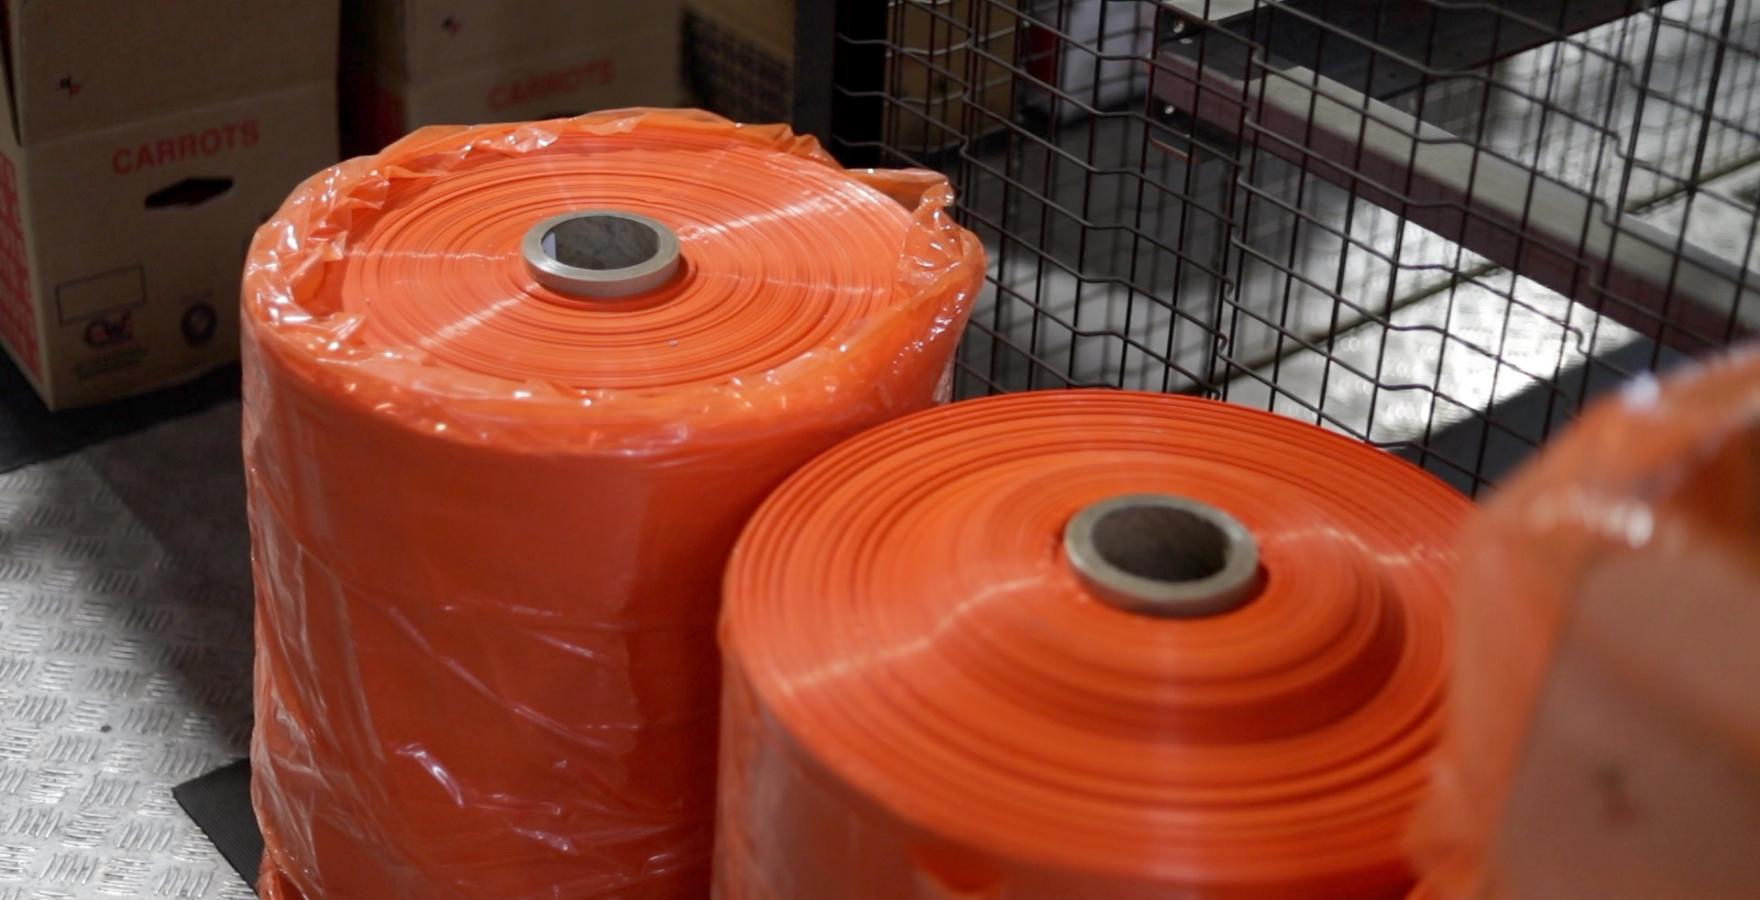 Signet's Orange Carton Liners